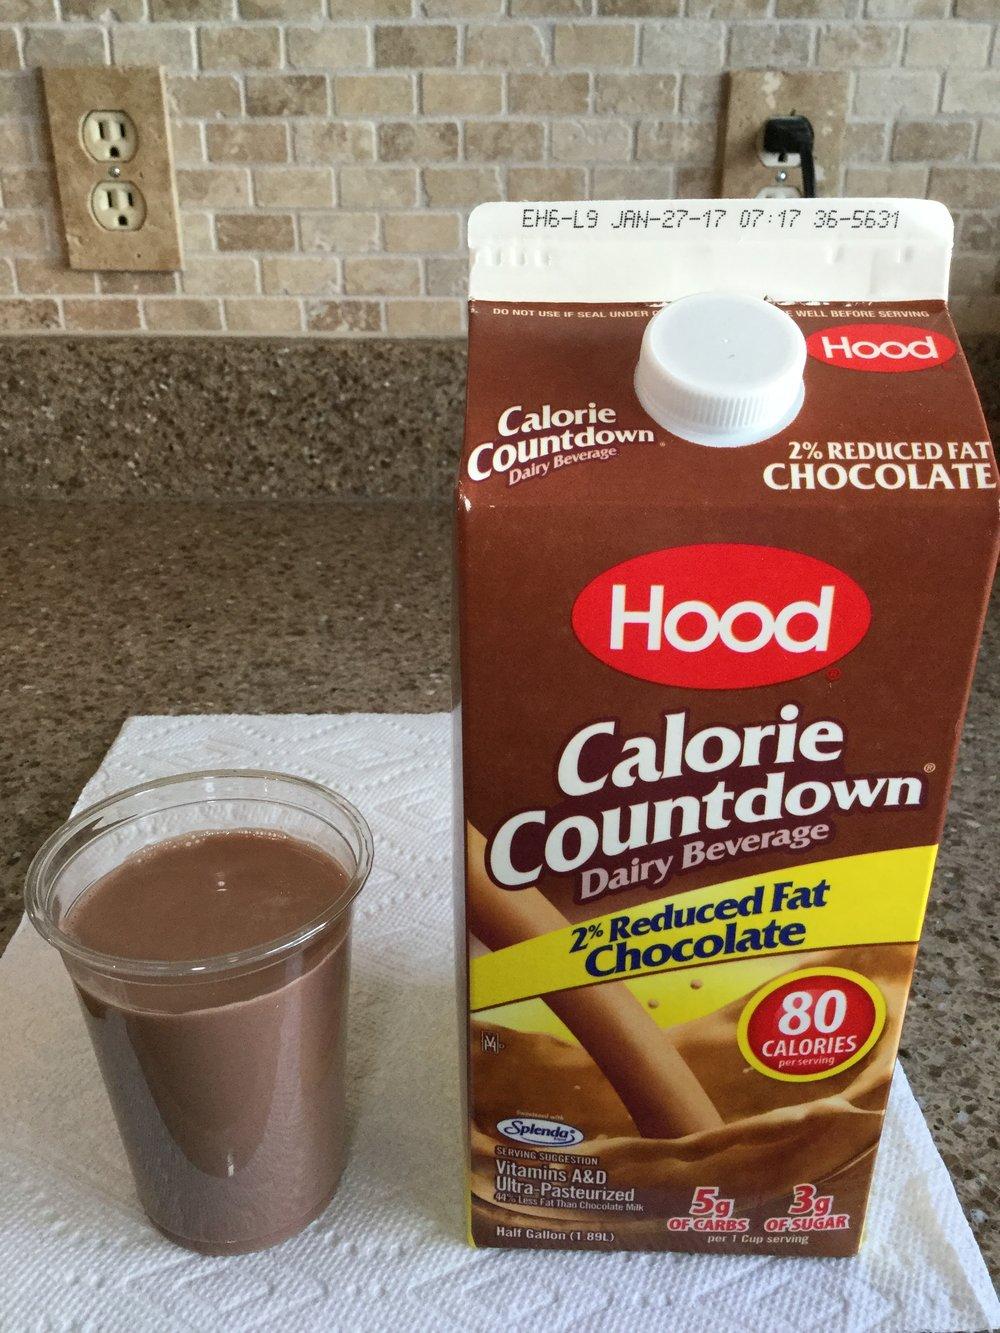 Hood Calorie Countdown 2% Chocolate Dairy Beverage Cup